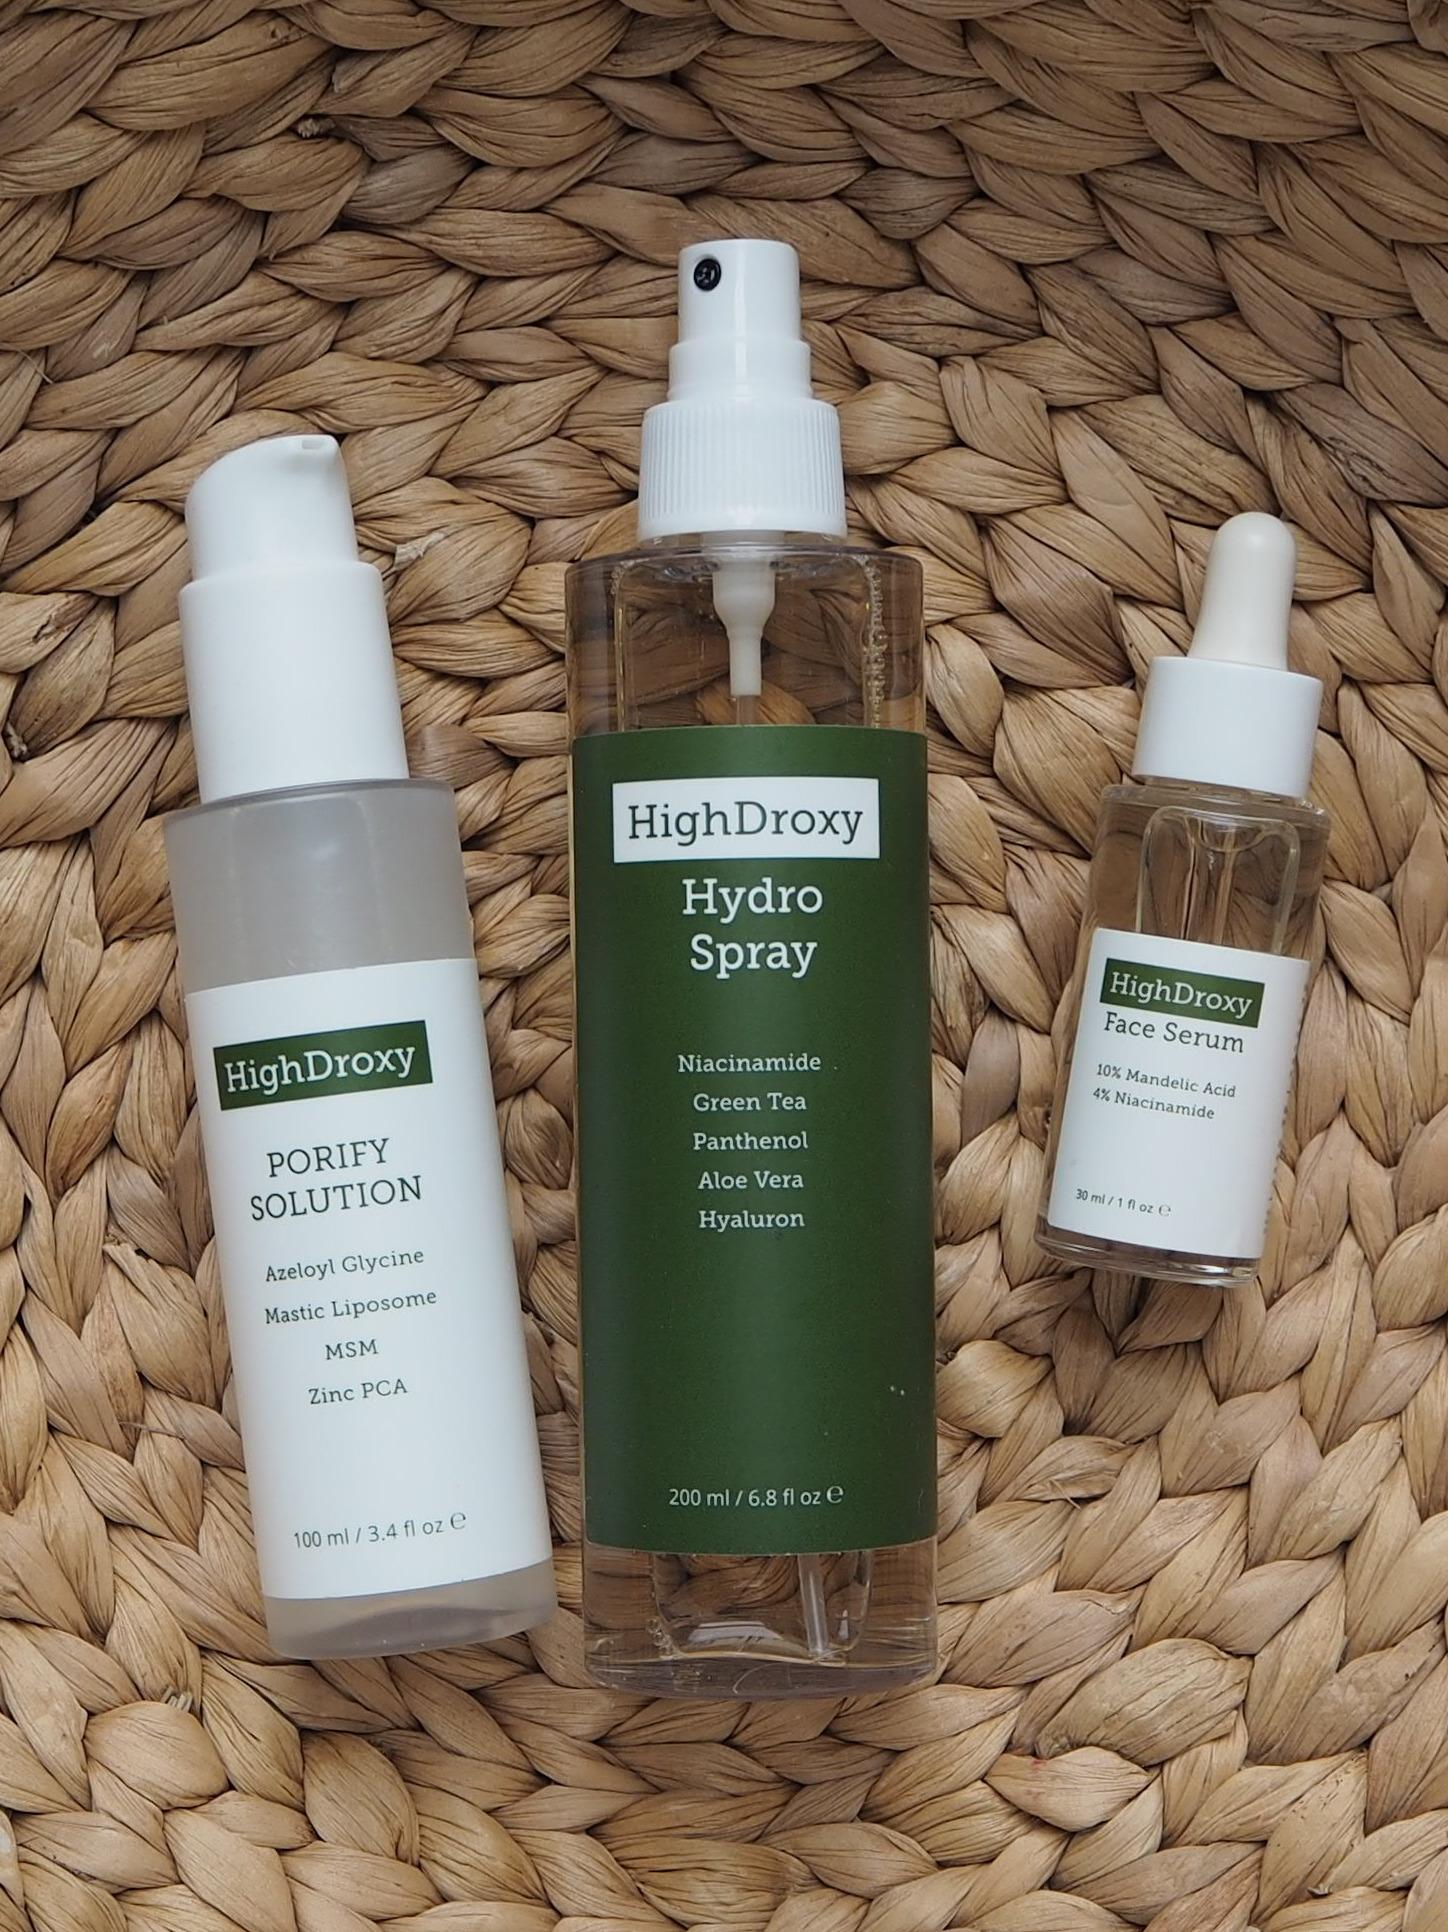 HighDroxy Porify Solution Hydro Spray Face Serum